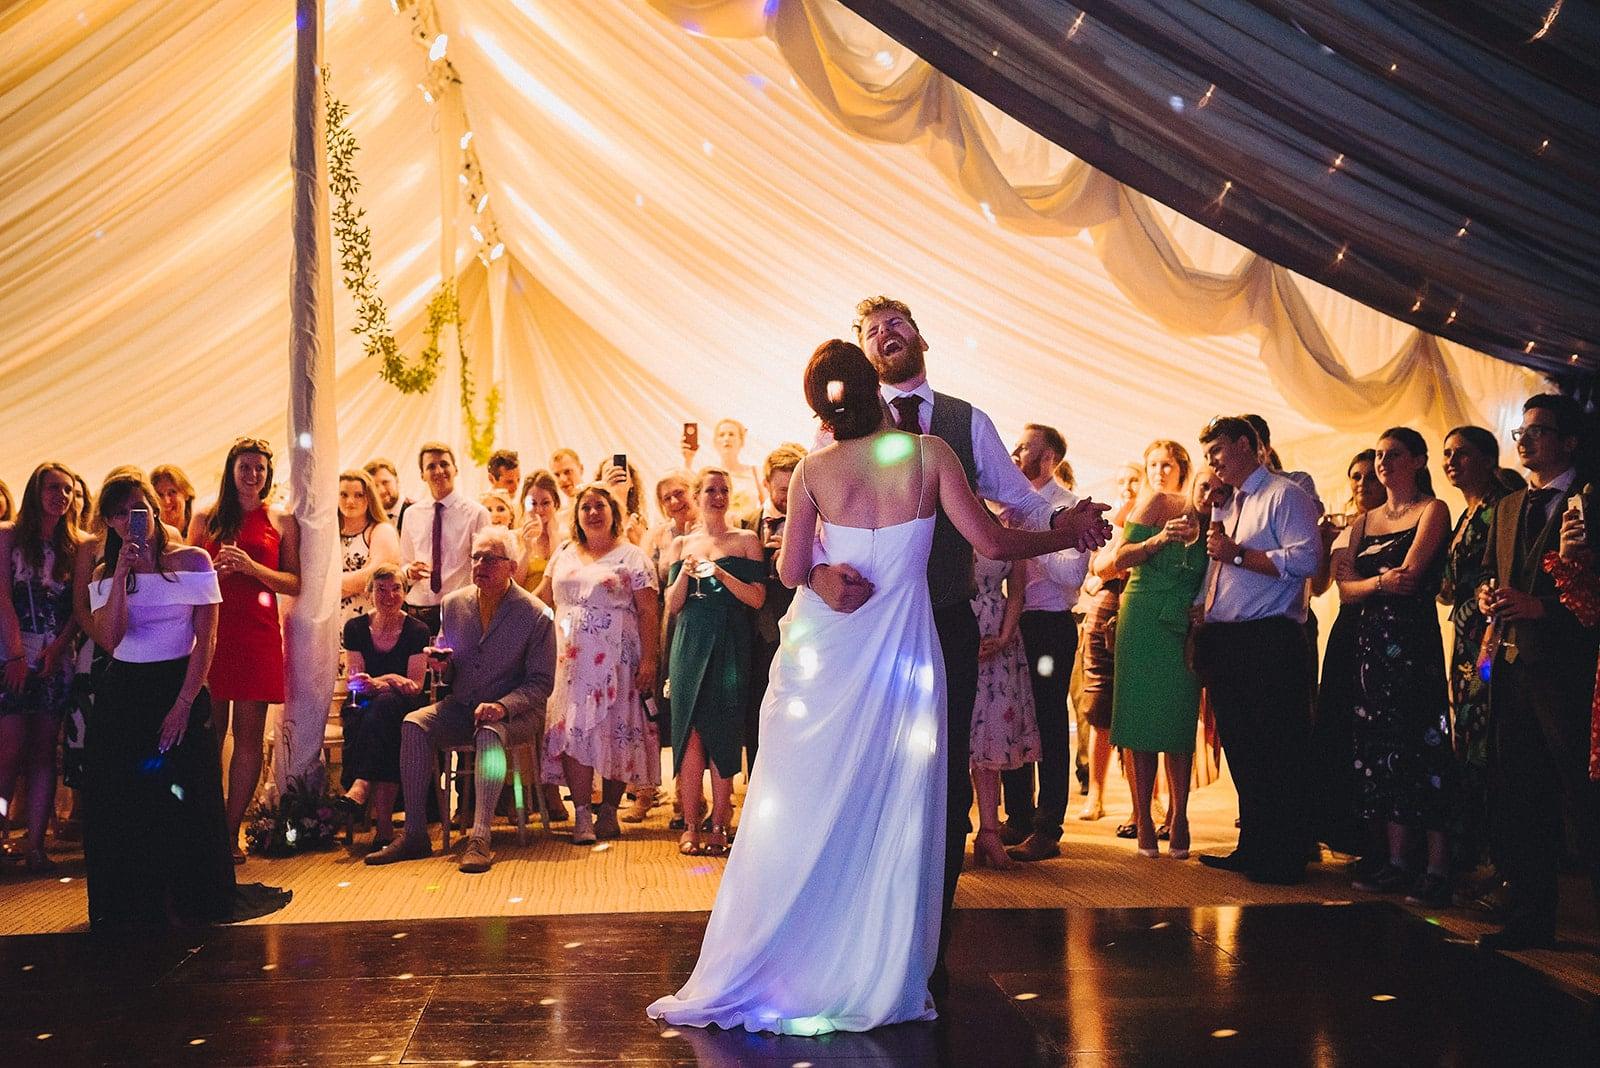 Bride and groom first dance at their joyful cambridge farm marquee wedding